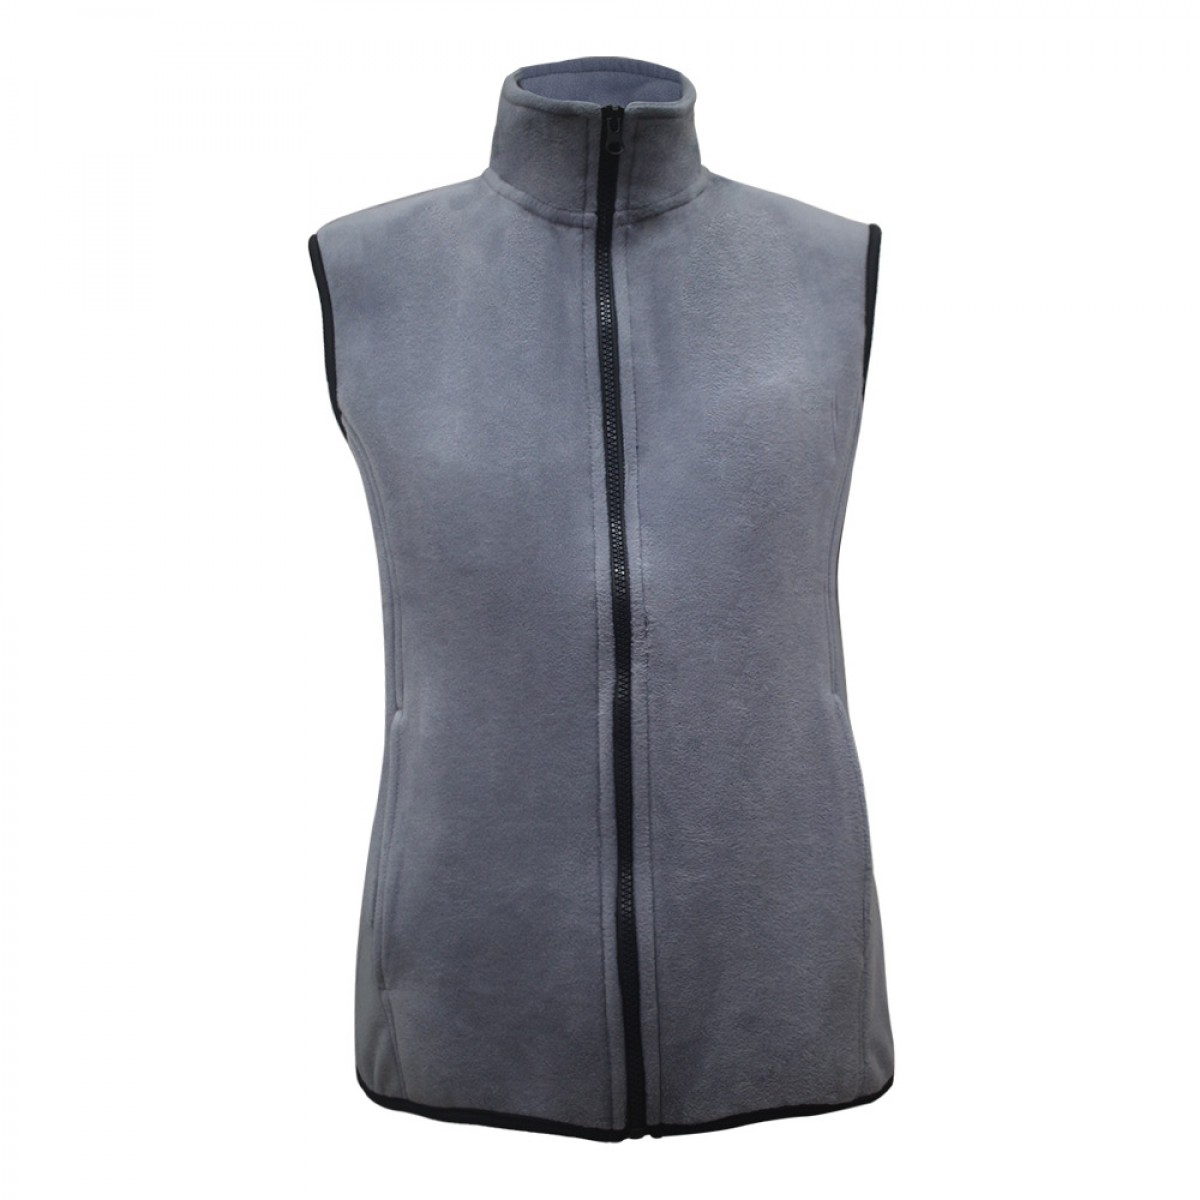 women-fleece-half-jacket-kfj96795-10a